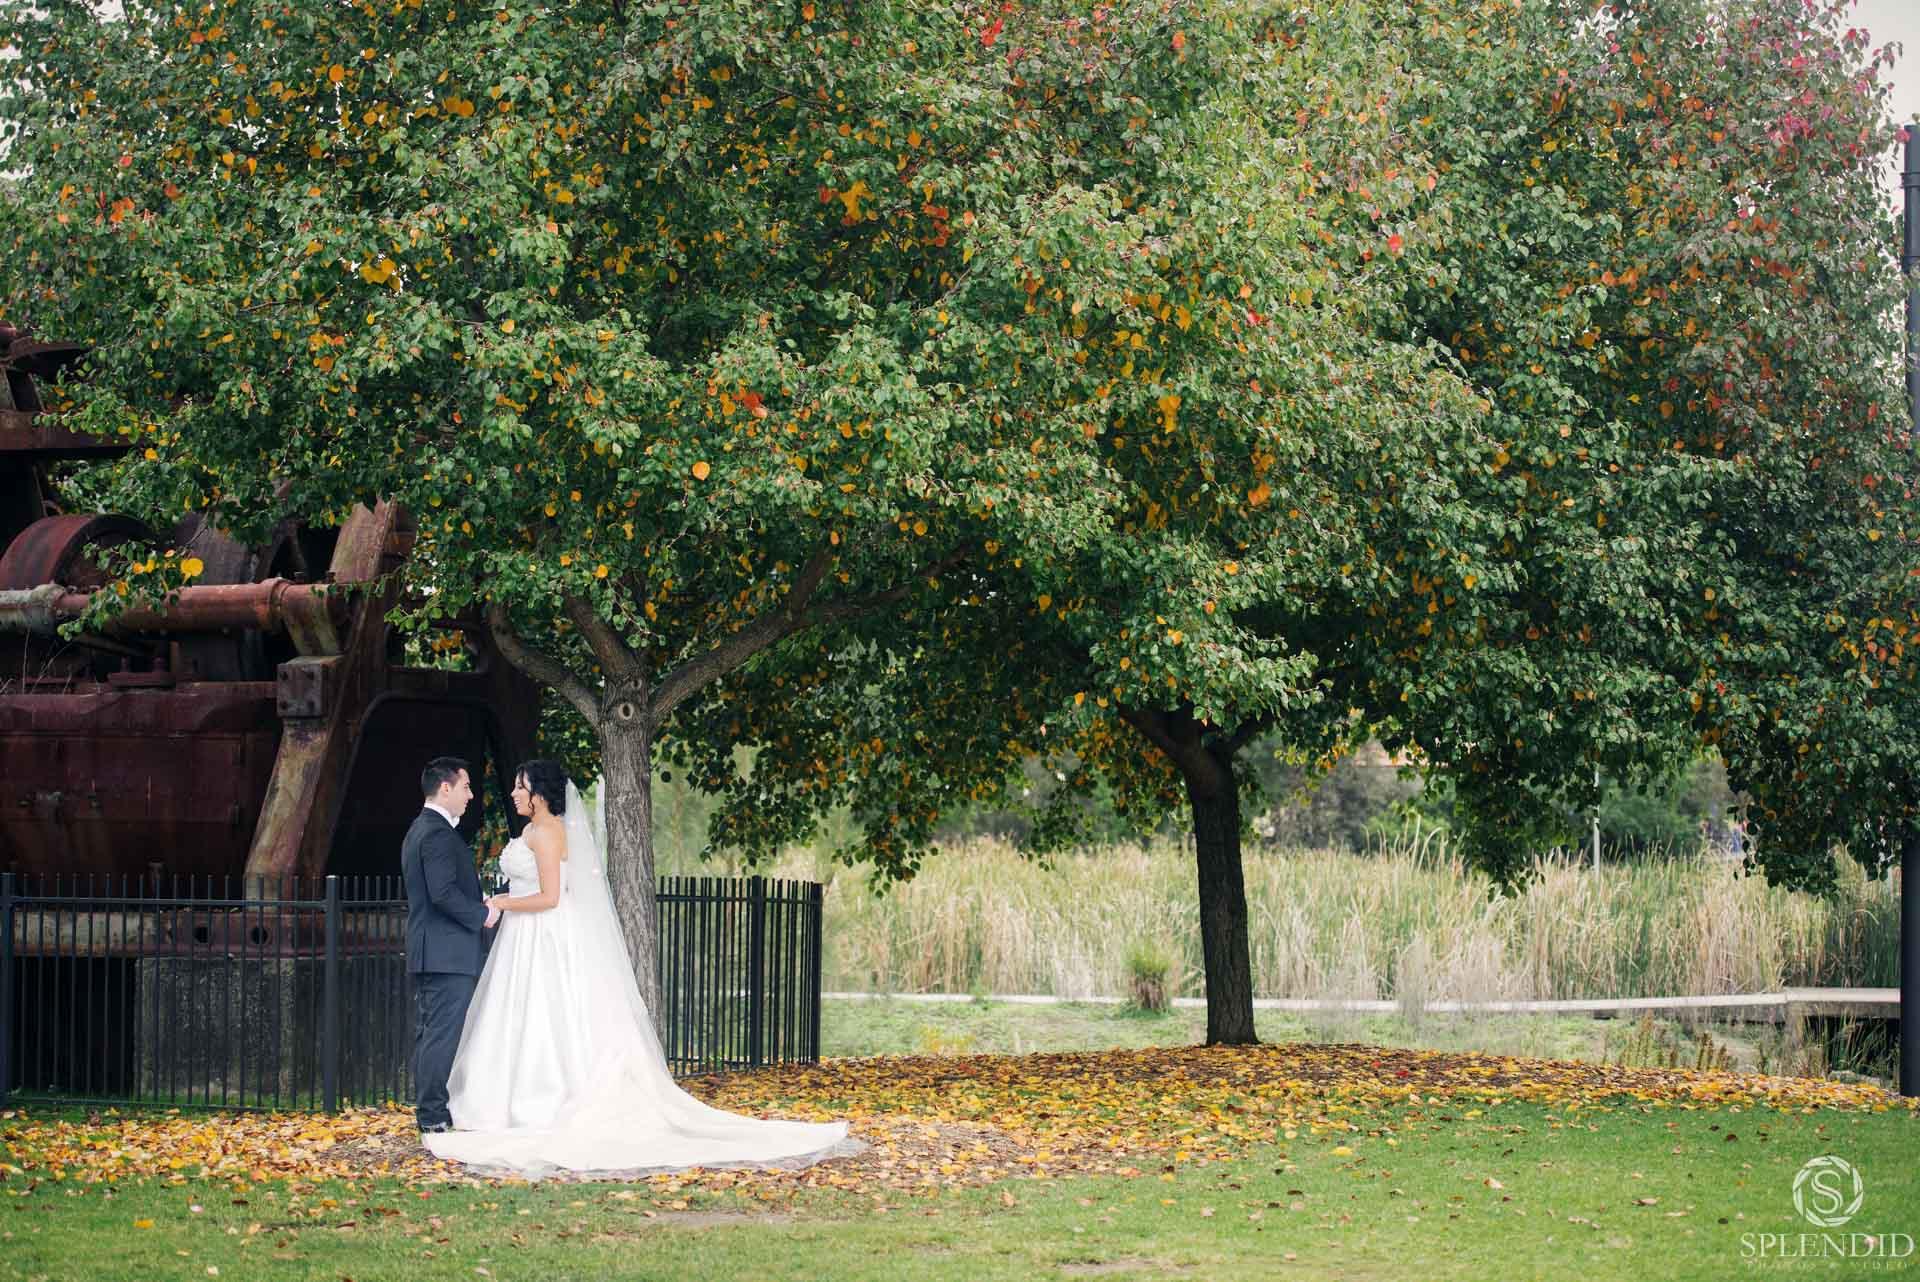 Conca D'oro Wedding: Olga and Paul - 1